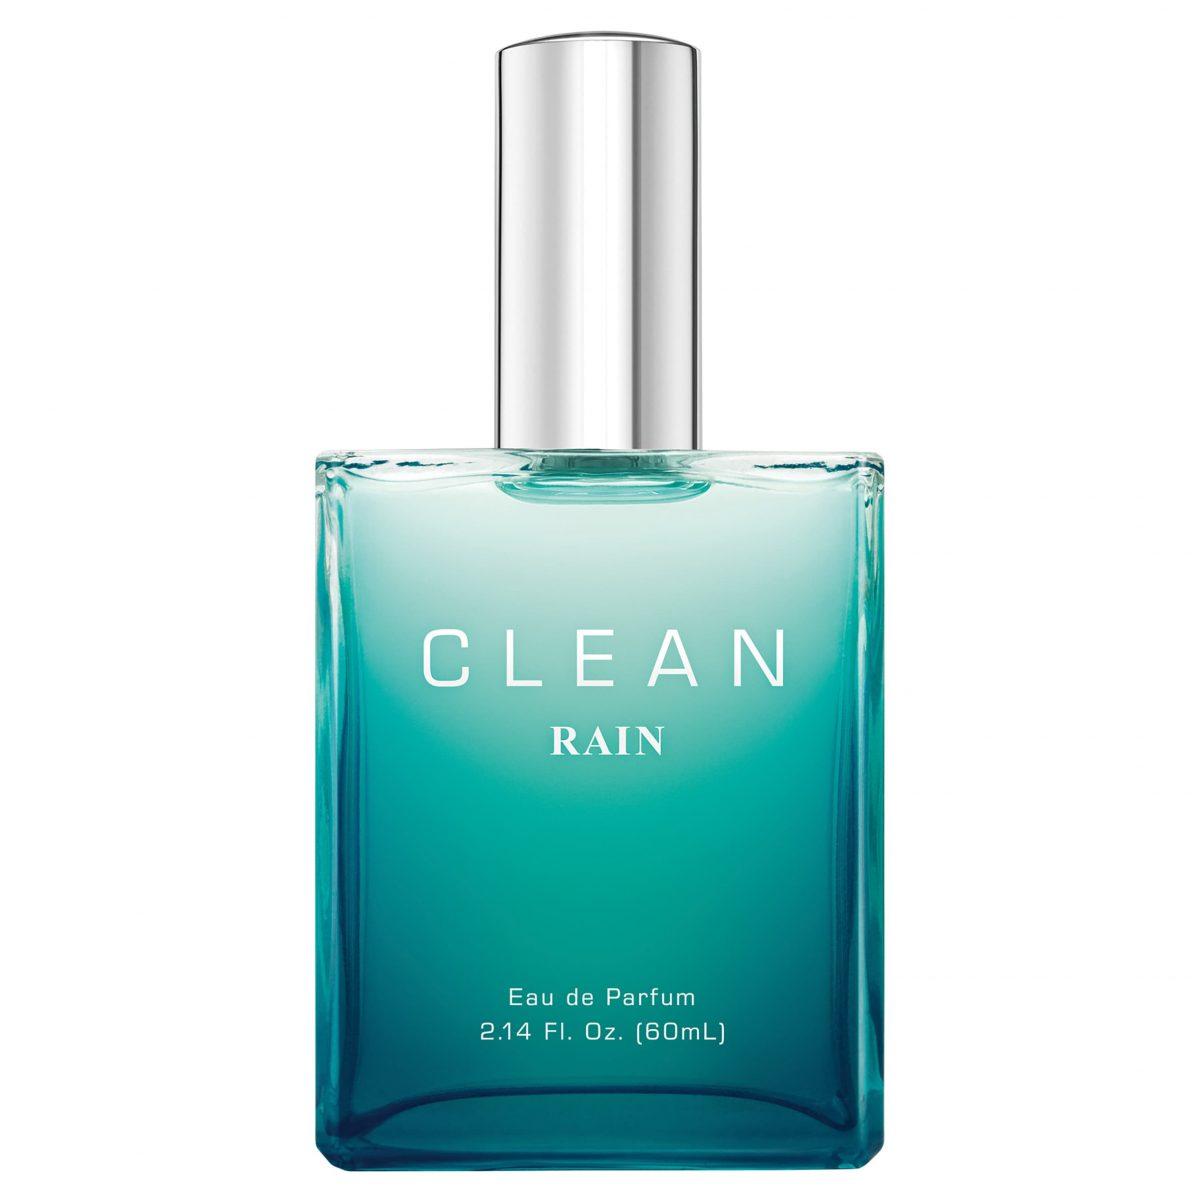 Den mest naturlige duft fra Clean parfumer